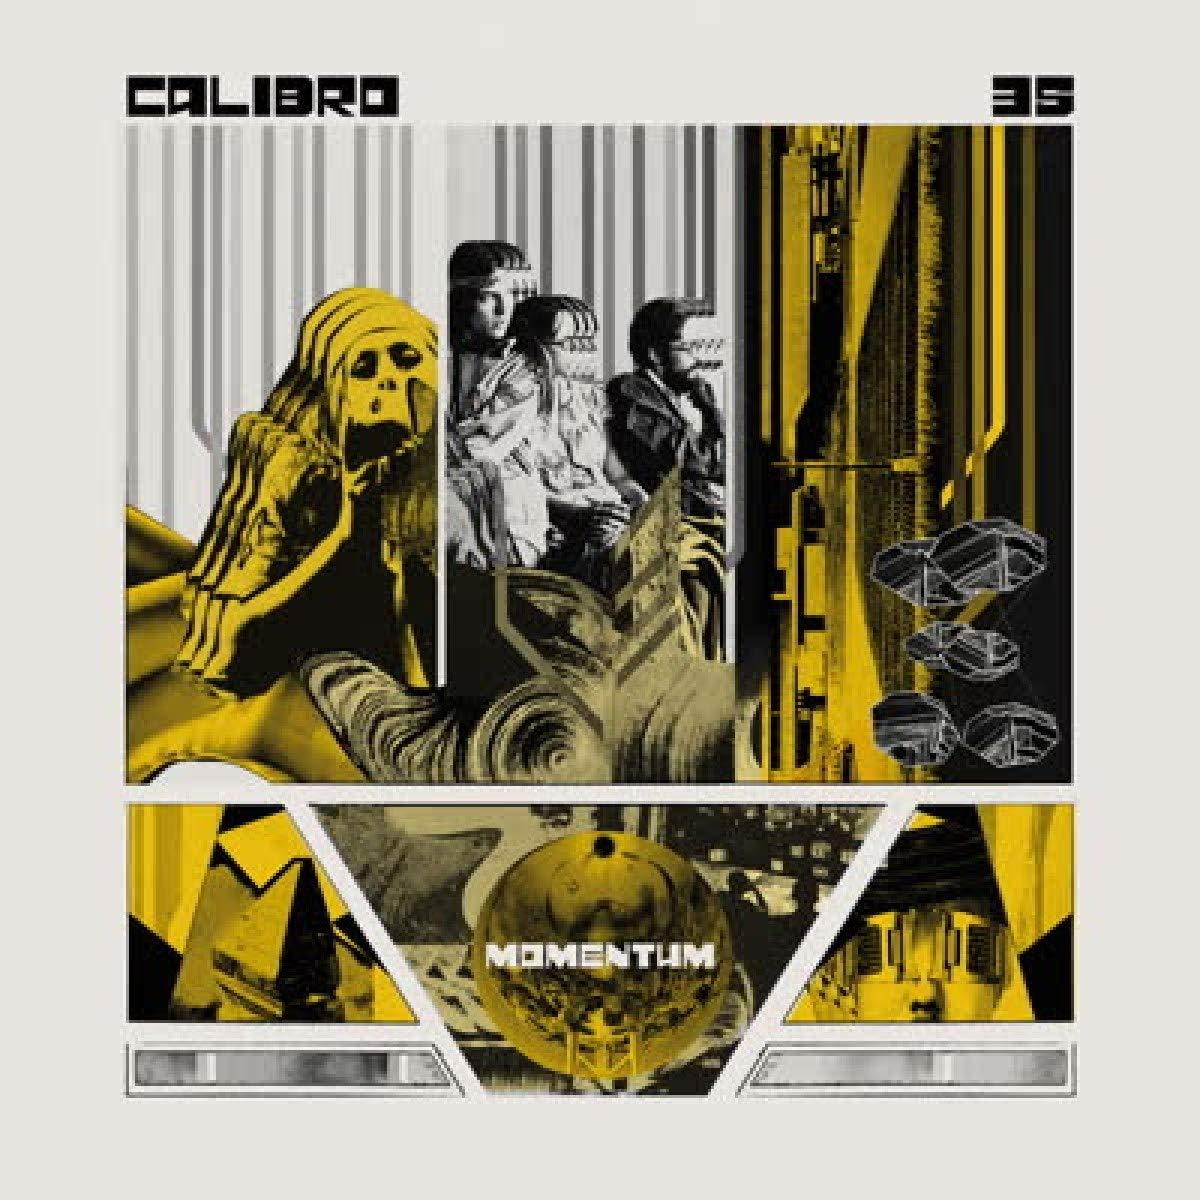 CALIBRO 35 - MOMENTUM (CD)